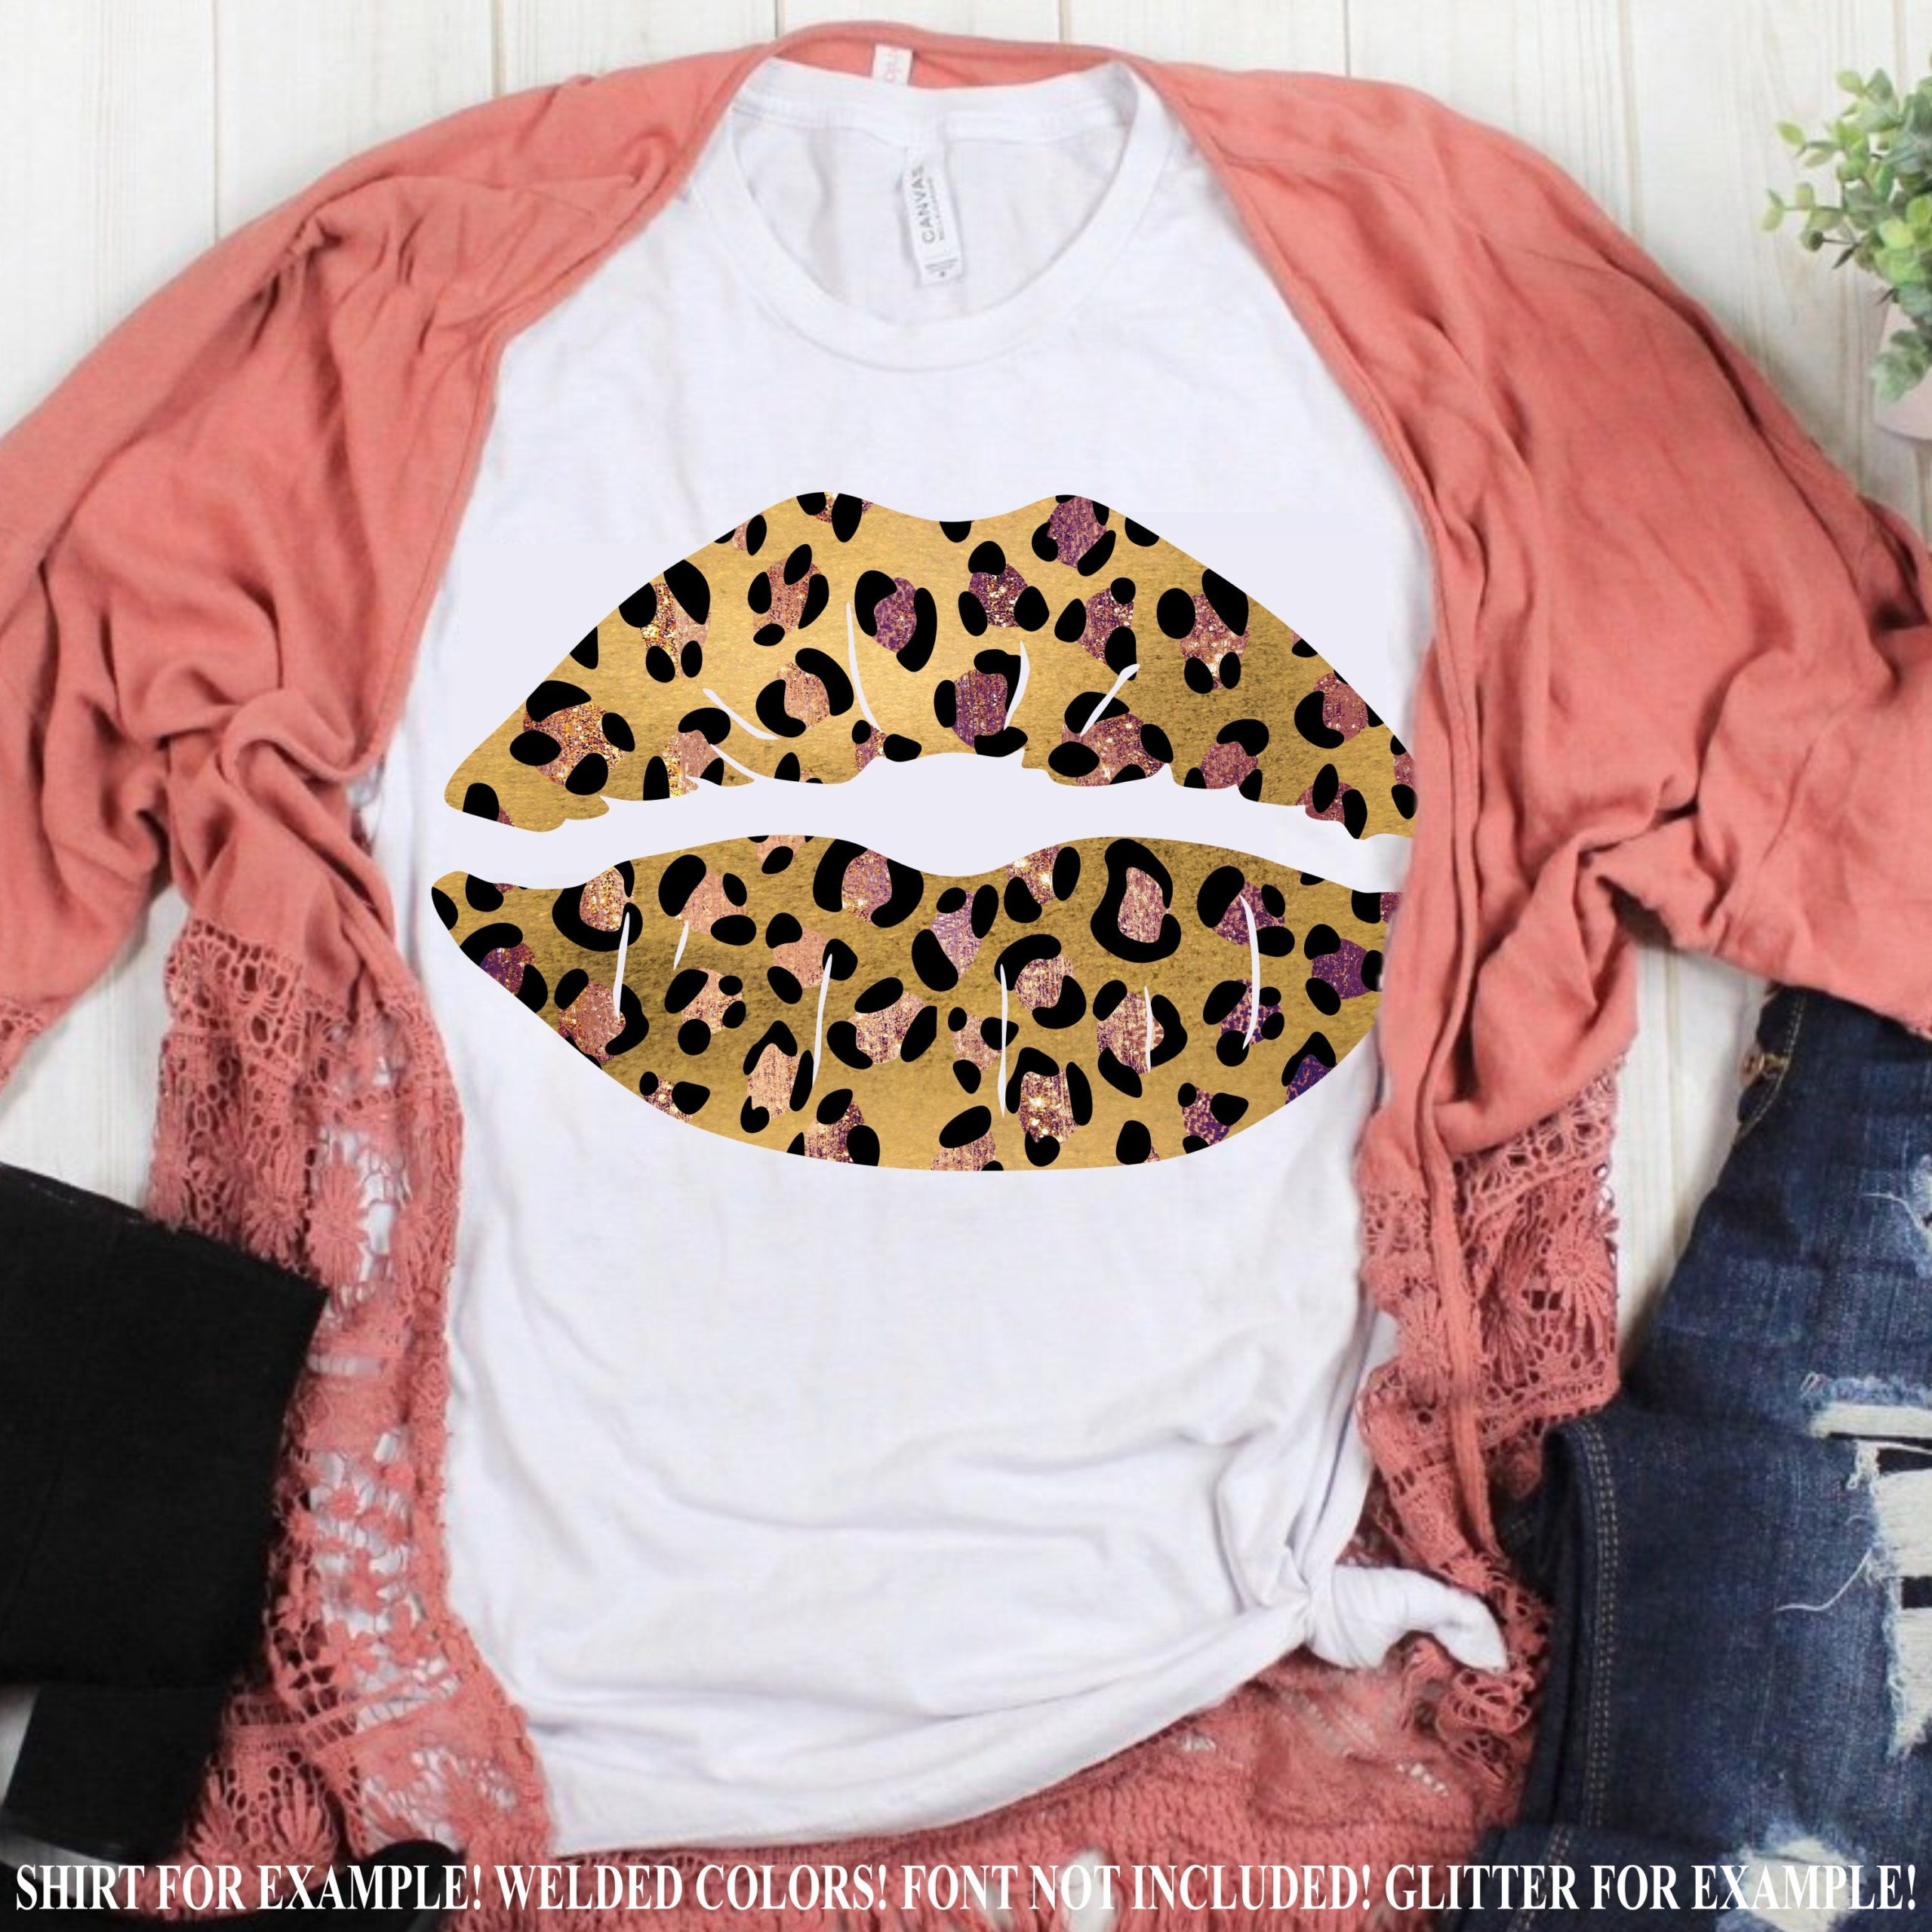 Leopard-print-lips-svg-cheetah-print-svgv-alentine-svgvalentines-svgvalentine-lips-svgcut-files-cricut-svg-svg-for-mobile-mobile-svg-605141e8